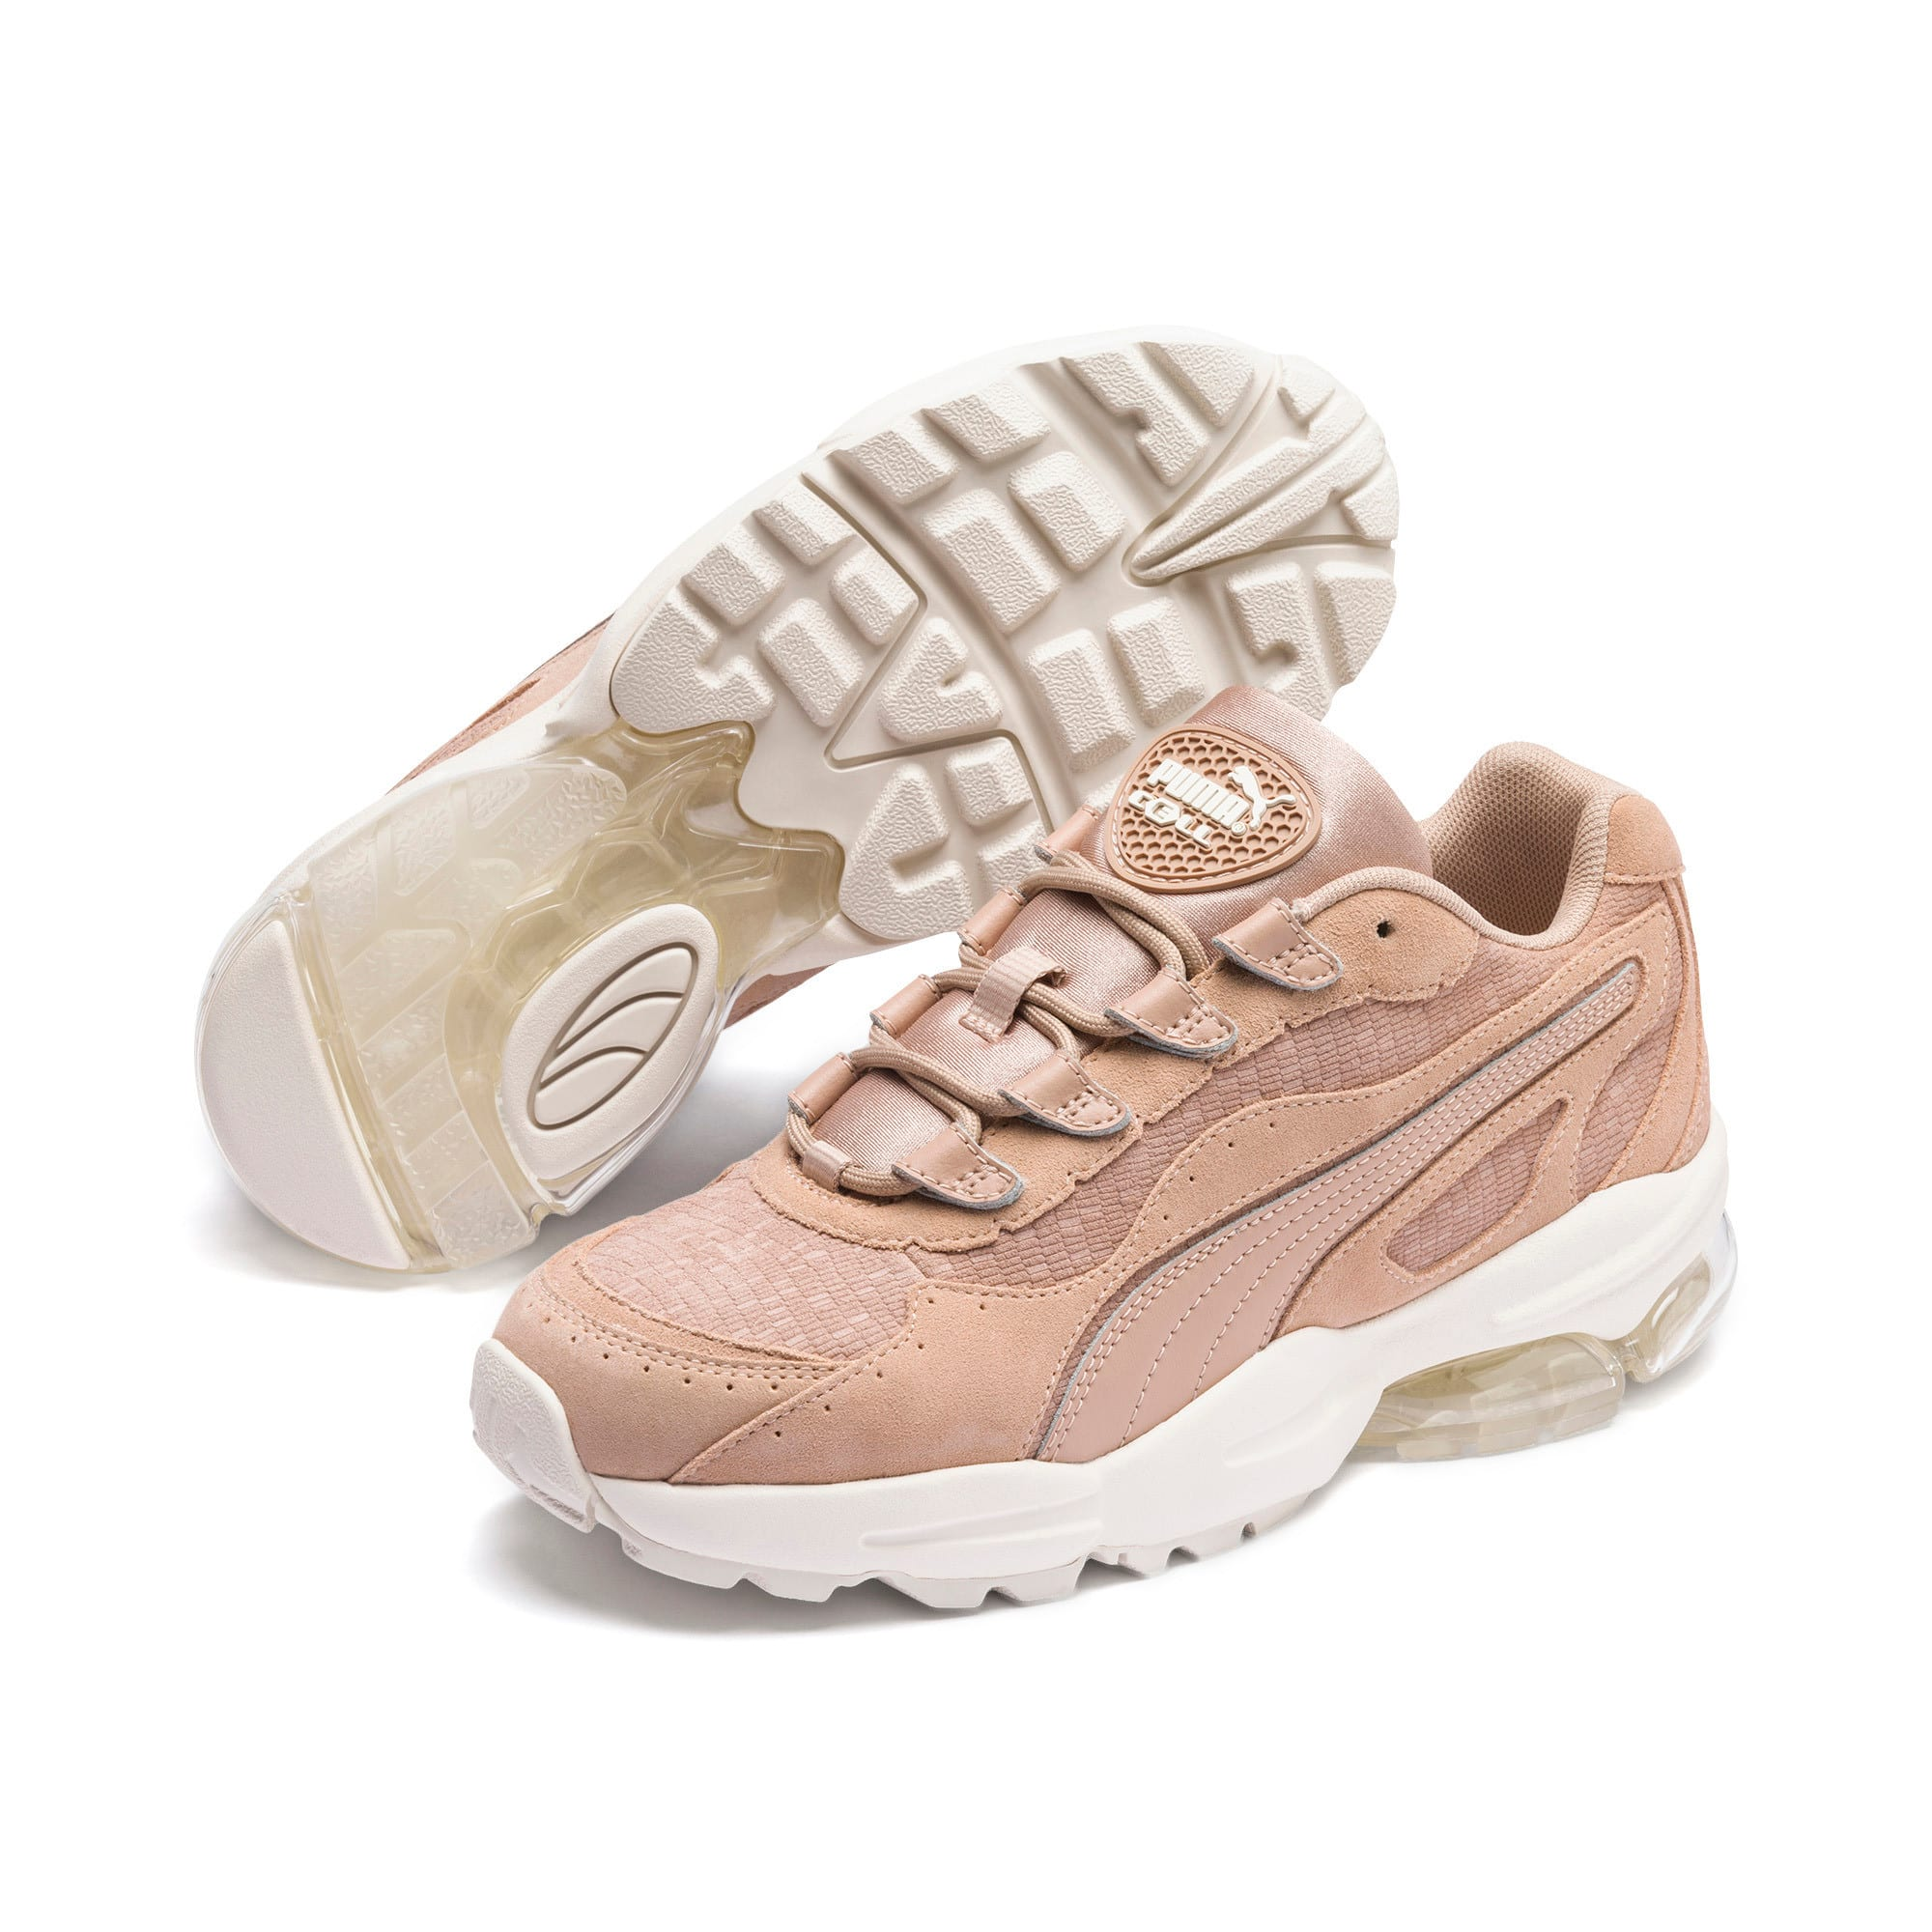 Thumbnail 2 of CELL Stellar Tonal Women's Sneakers, Nougat-Puma Team Gold, medium